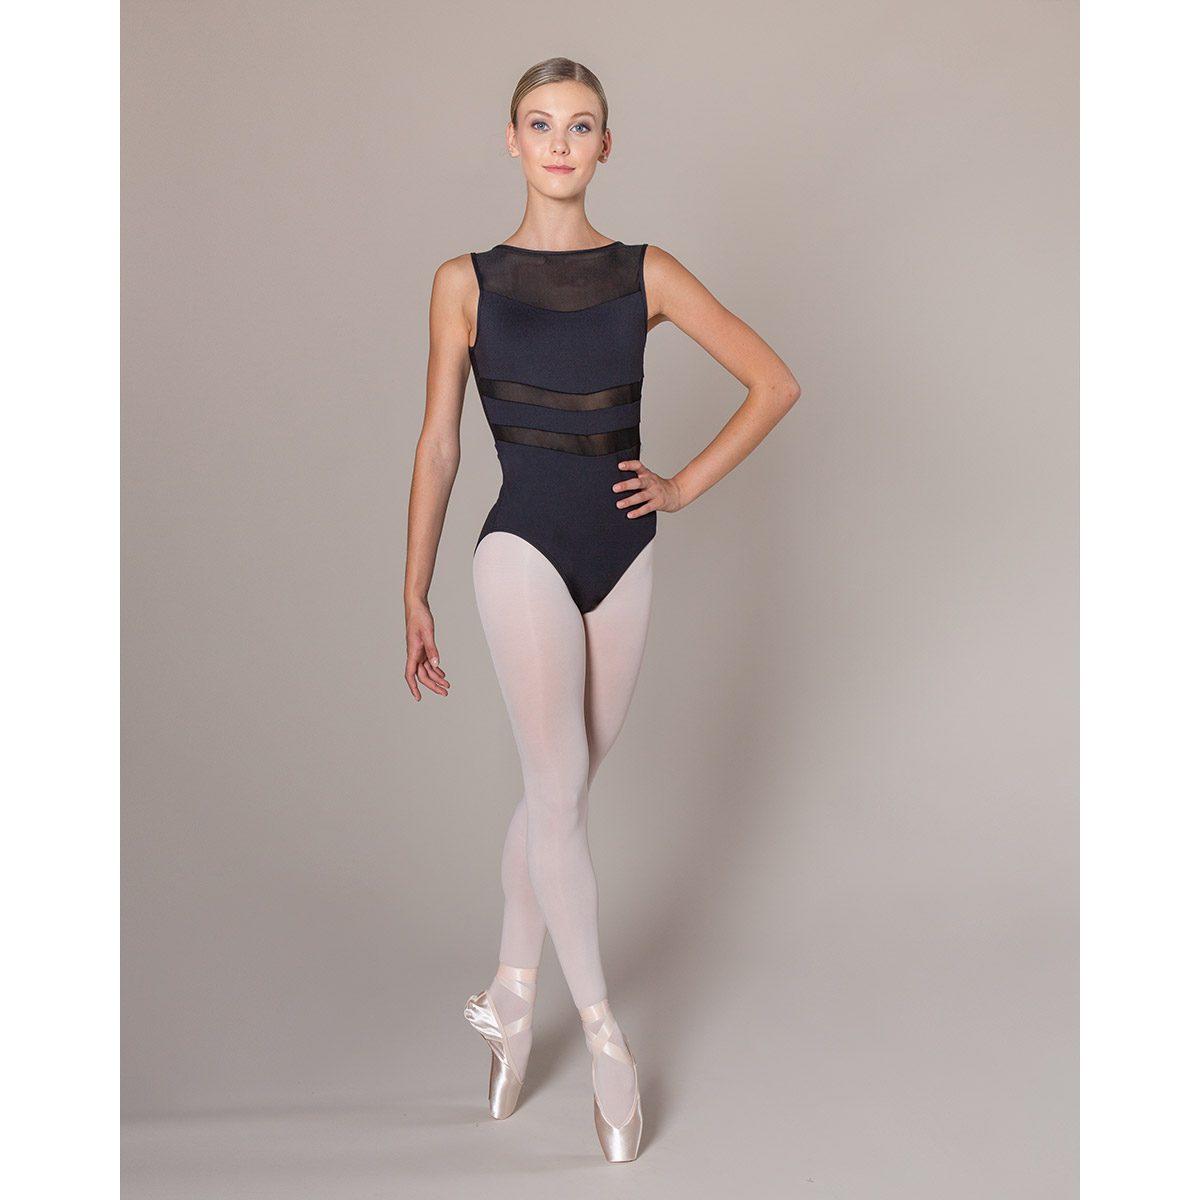 33fccc3f3fe11 Energetiks Lexi Mesh Leotard - Adult - Dance Desire Dance Store